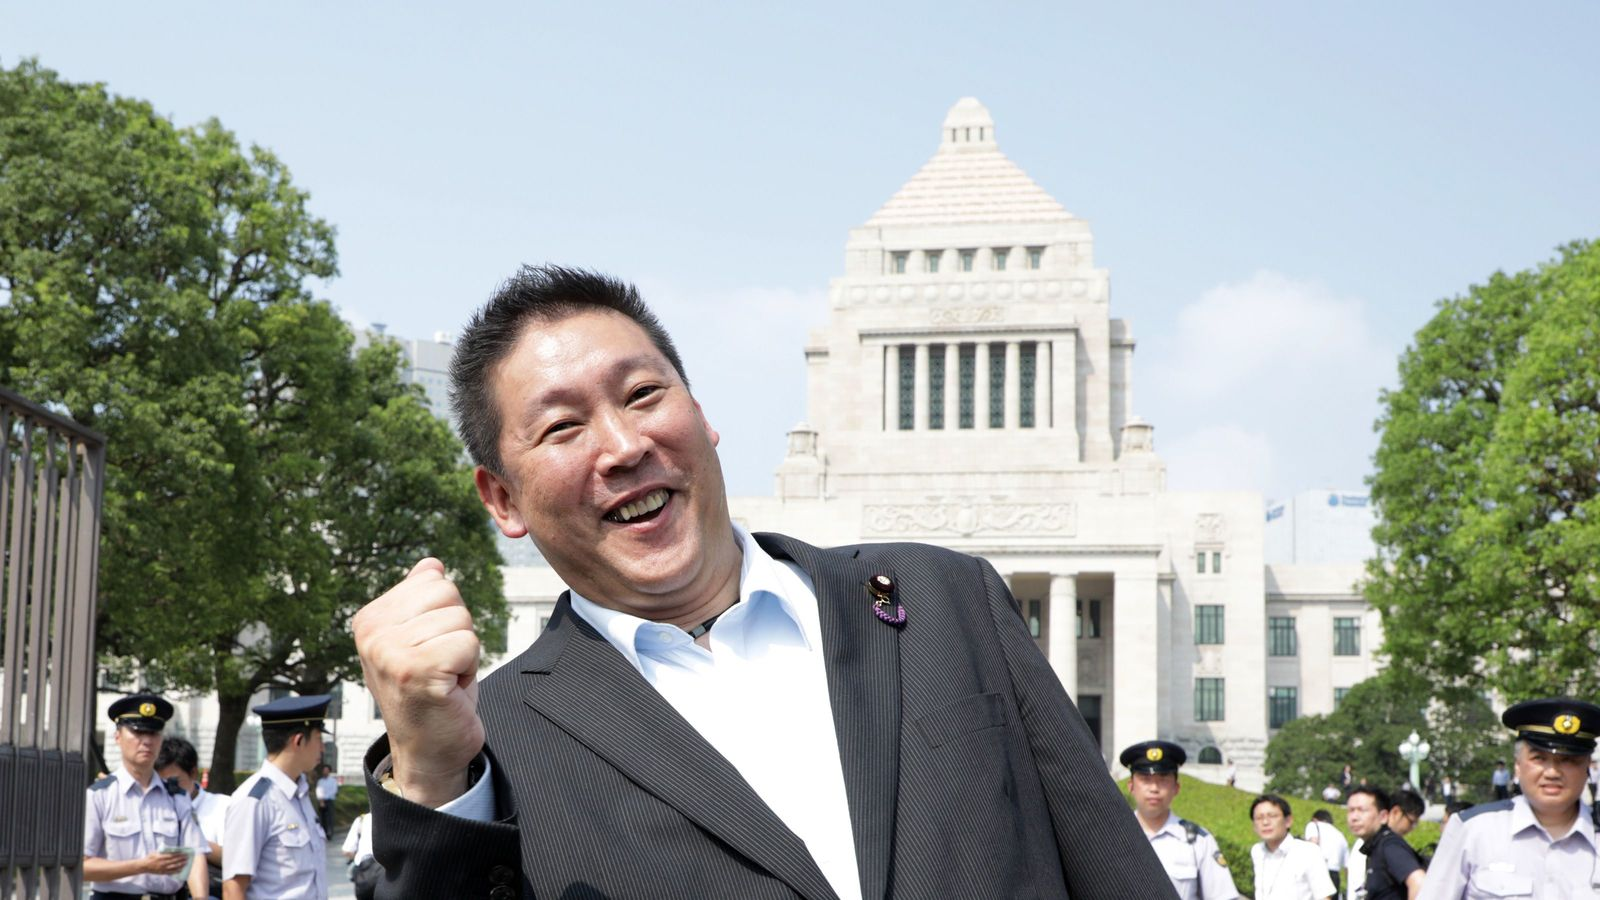 「NHKをぶっ壊す」と安倍政権が手を組む可能性 N国の増殖は憲法改正と表裏の関係